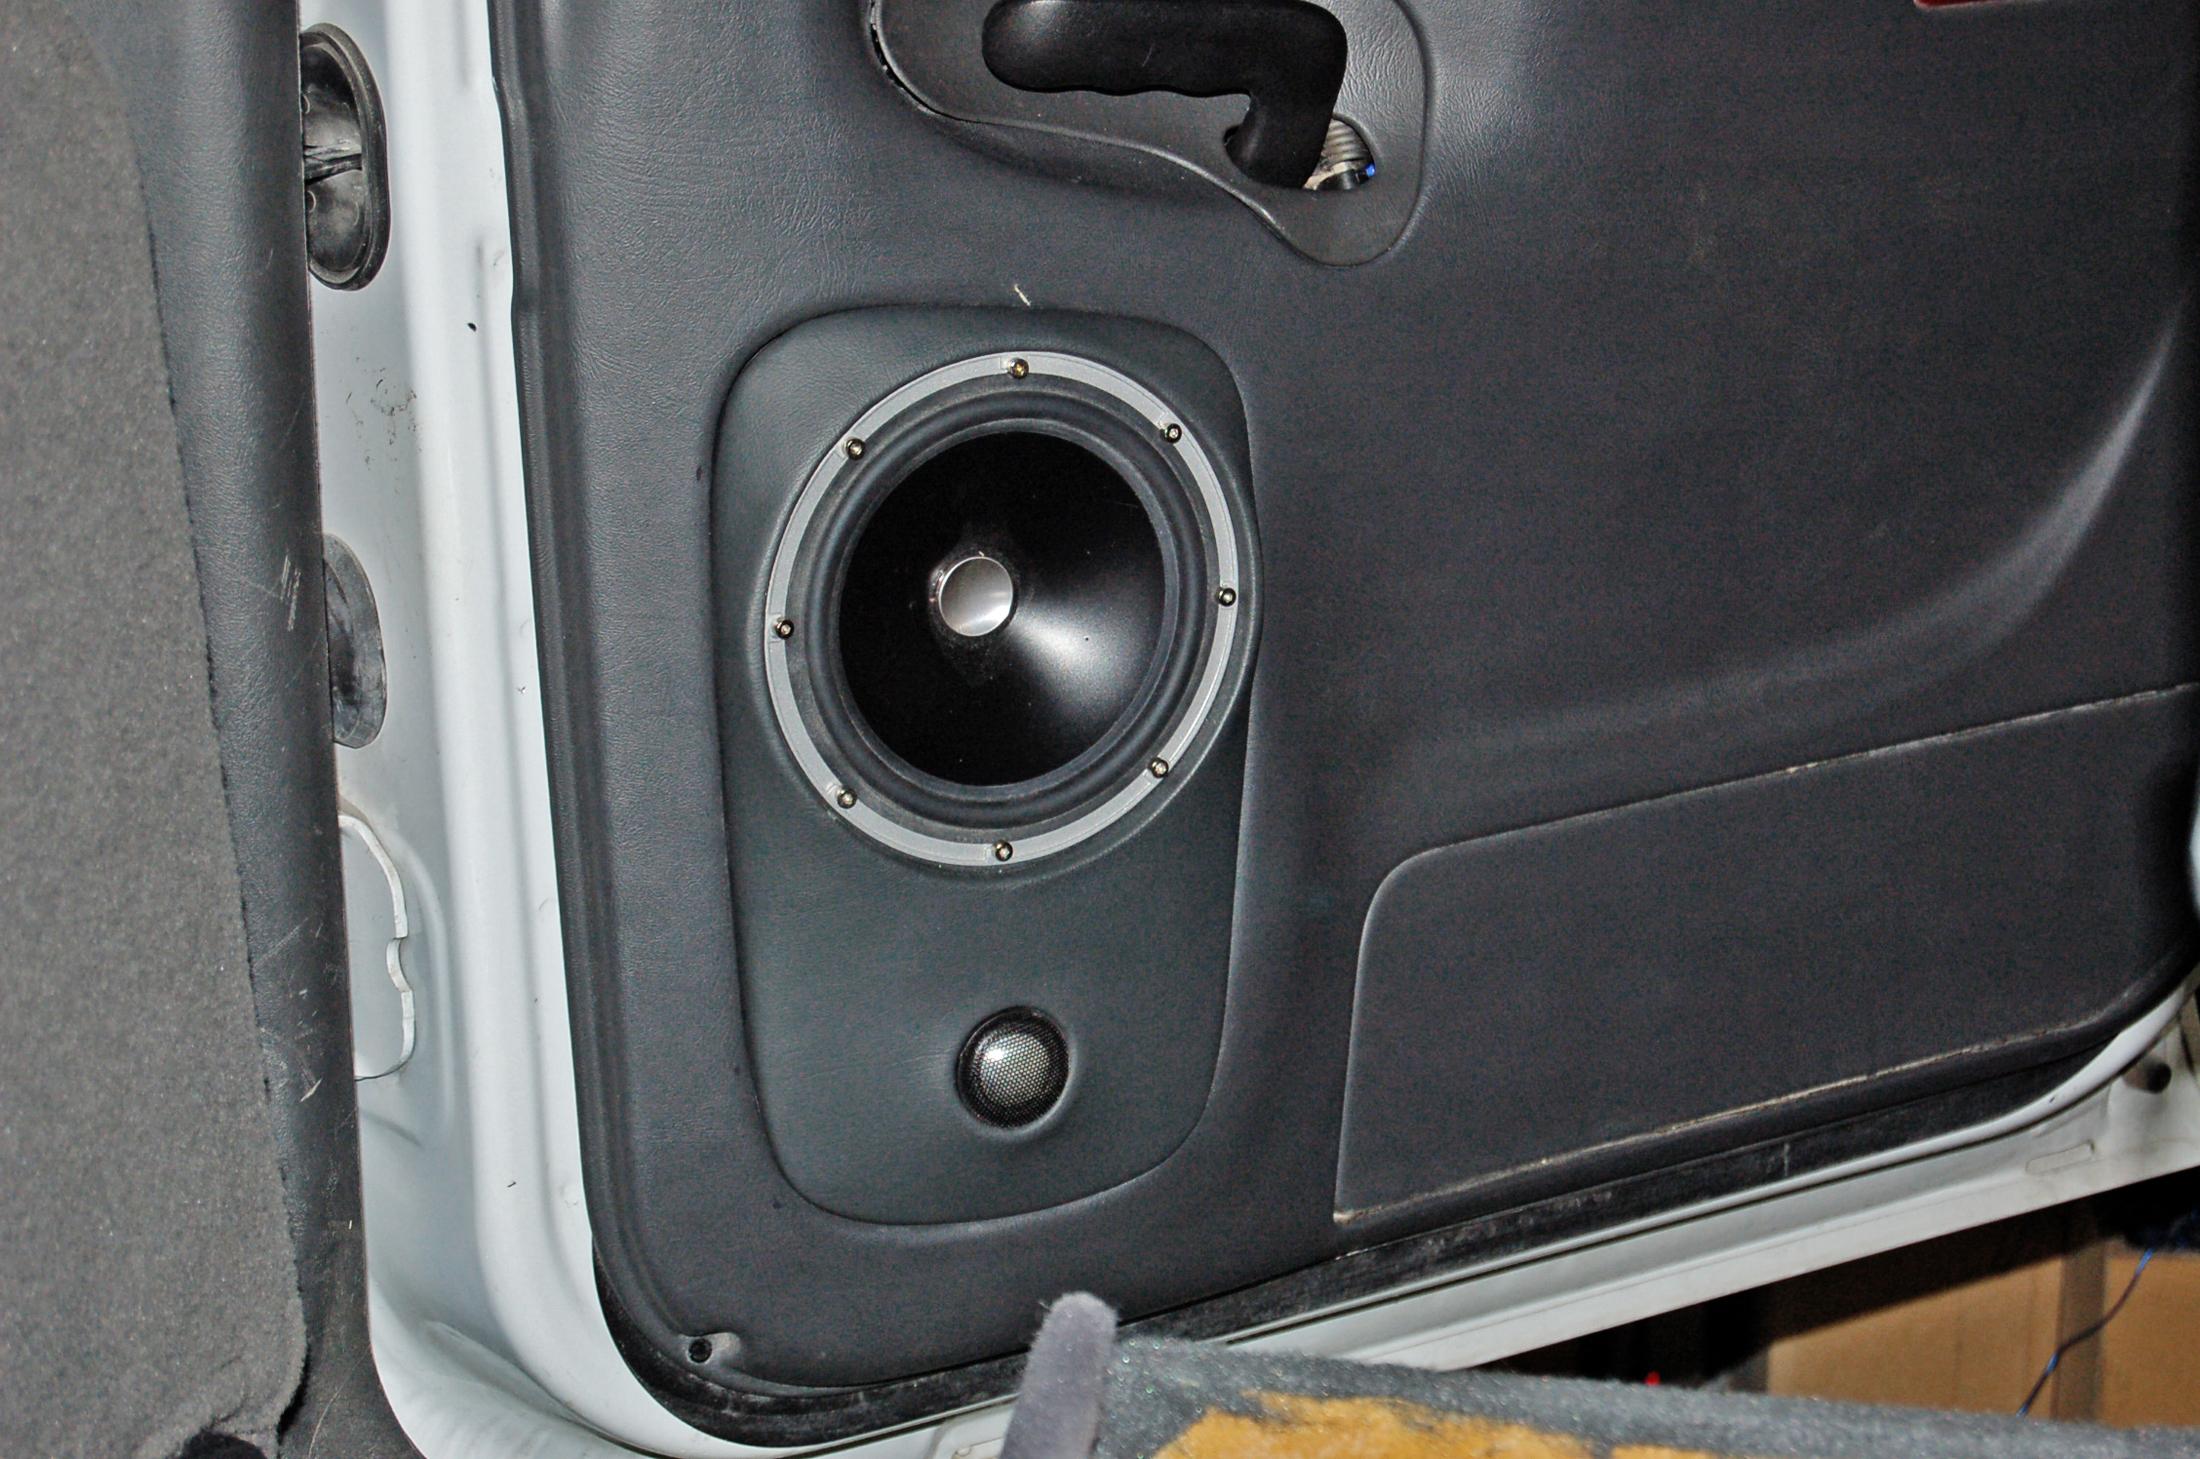 ... jl audio zr650 speakers in sierra rear door ... & GMC Sierra 2500HD | Santa Fe Auto Sound pezcame.com